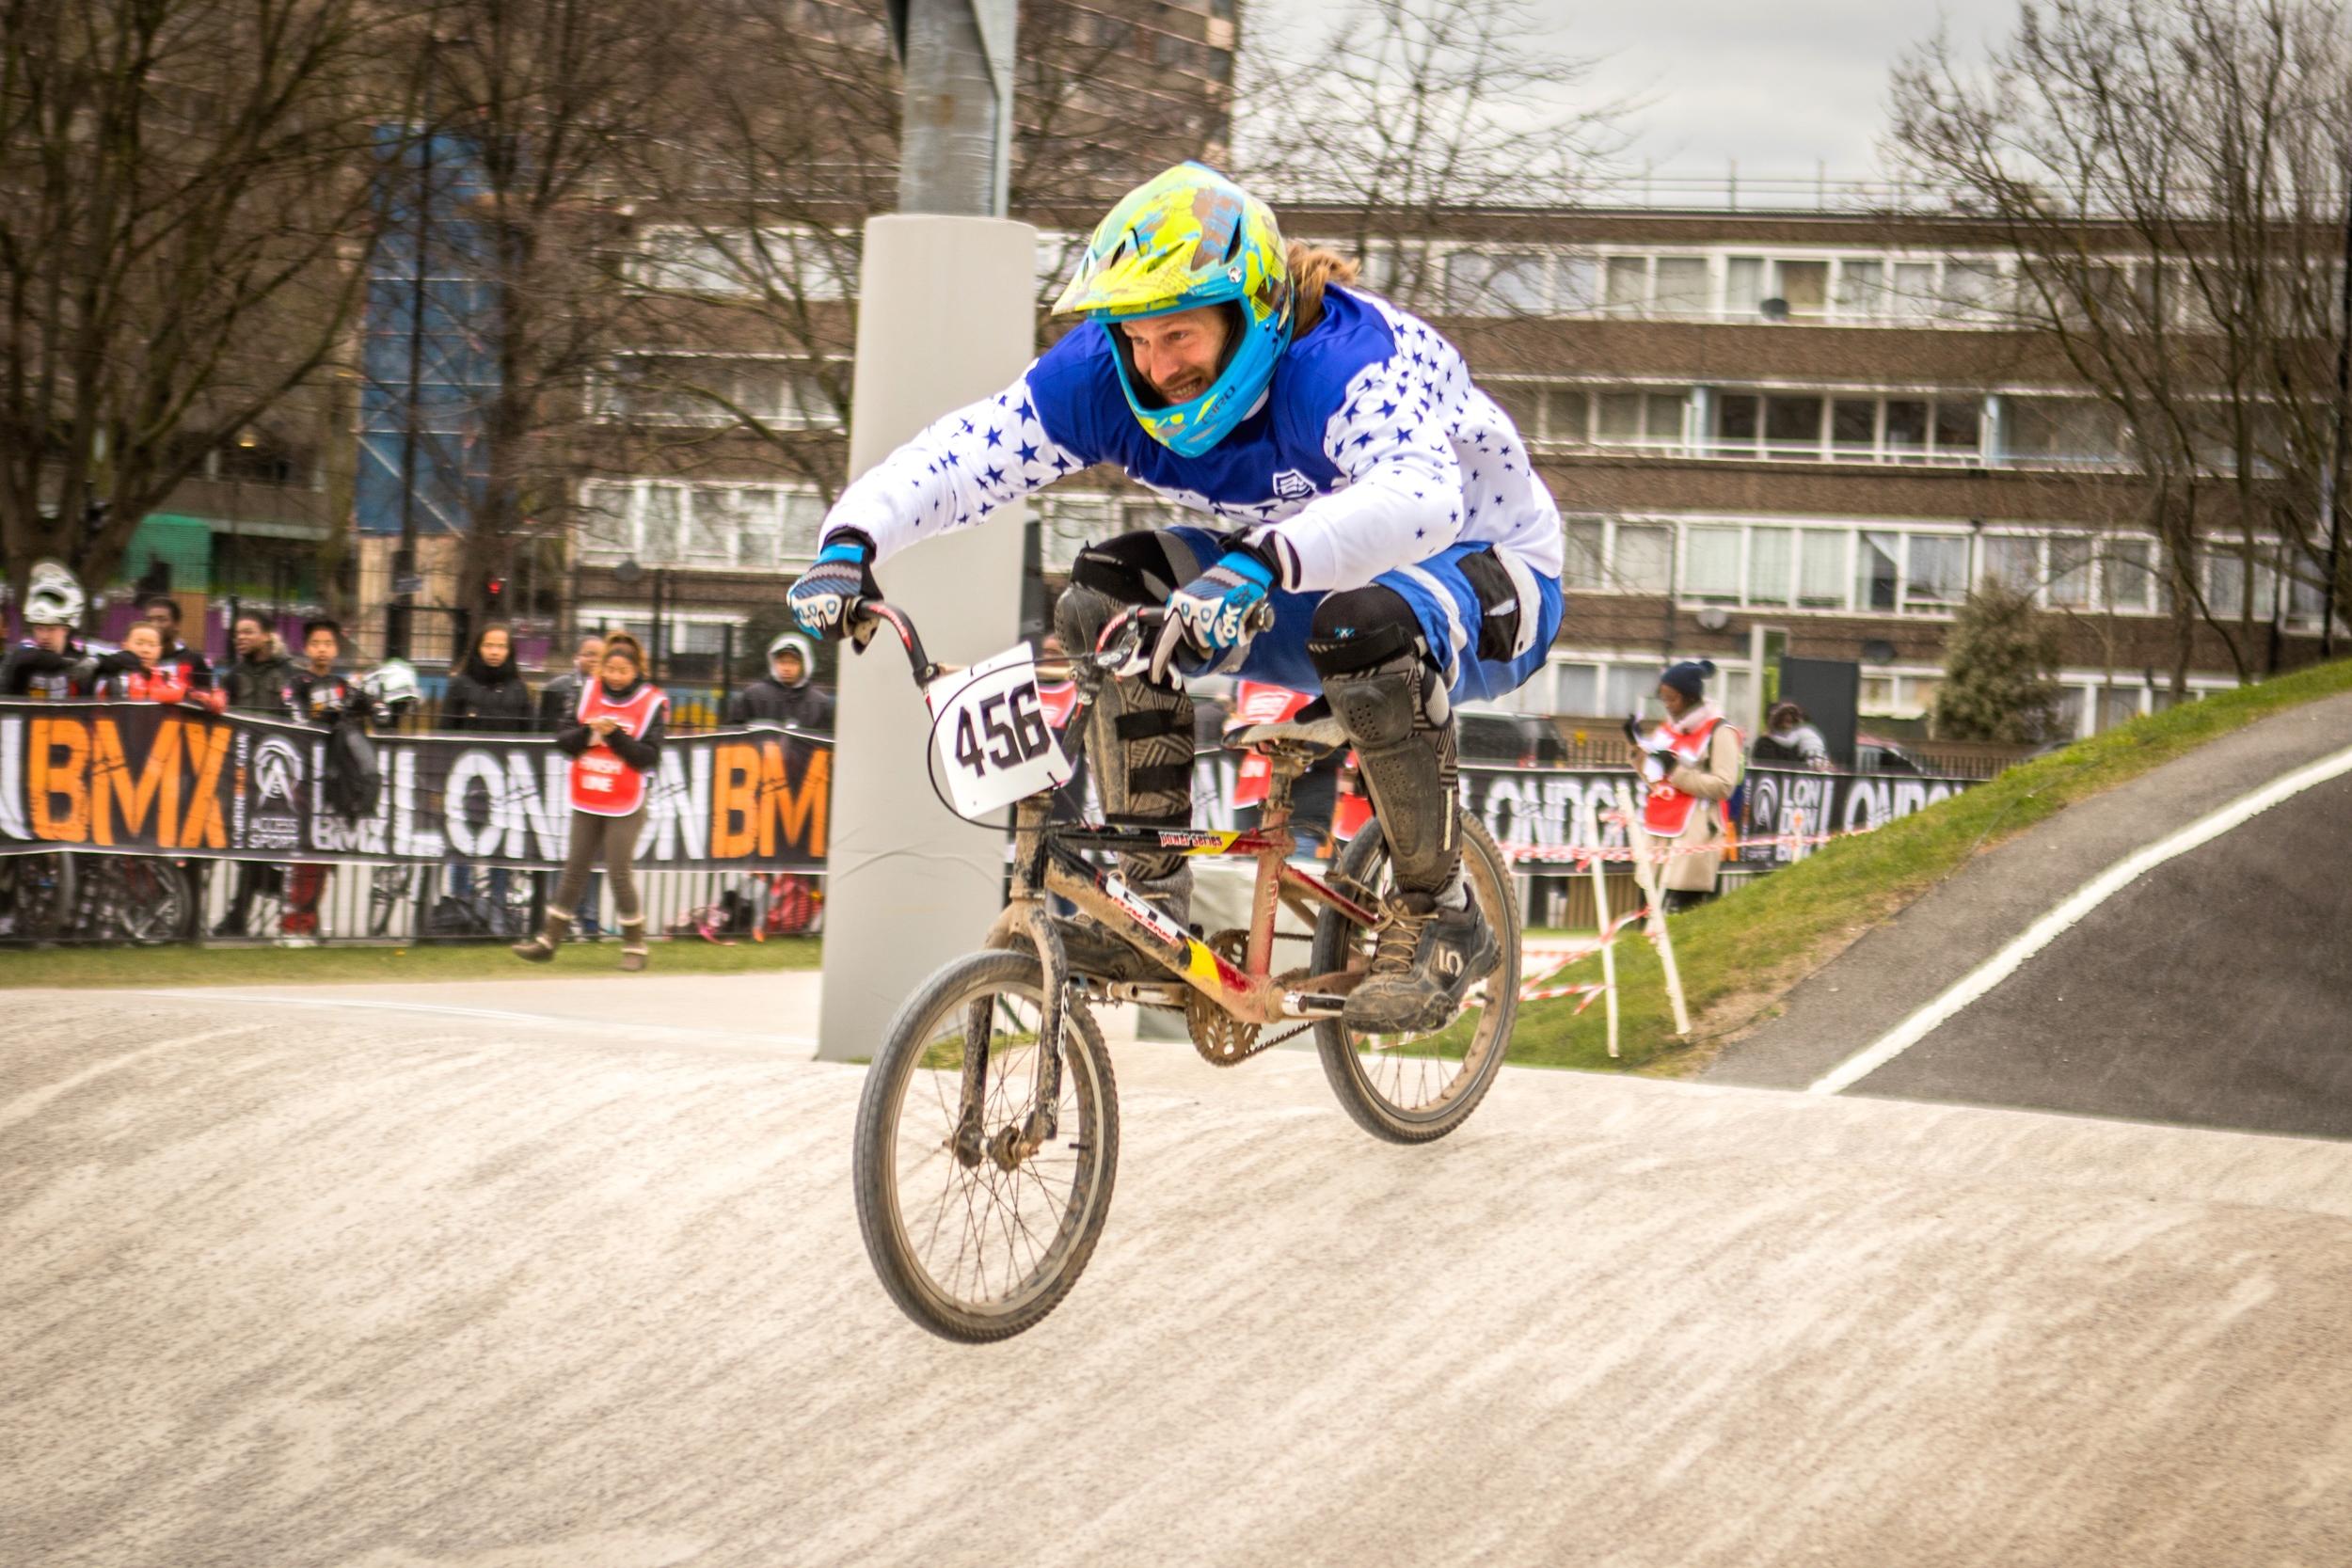 GREGORY EPPS, 250LONDON BMX Series 2016, Peckham